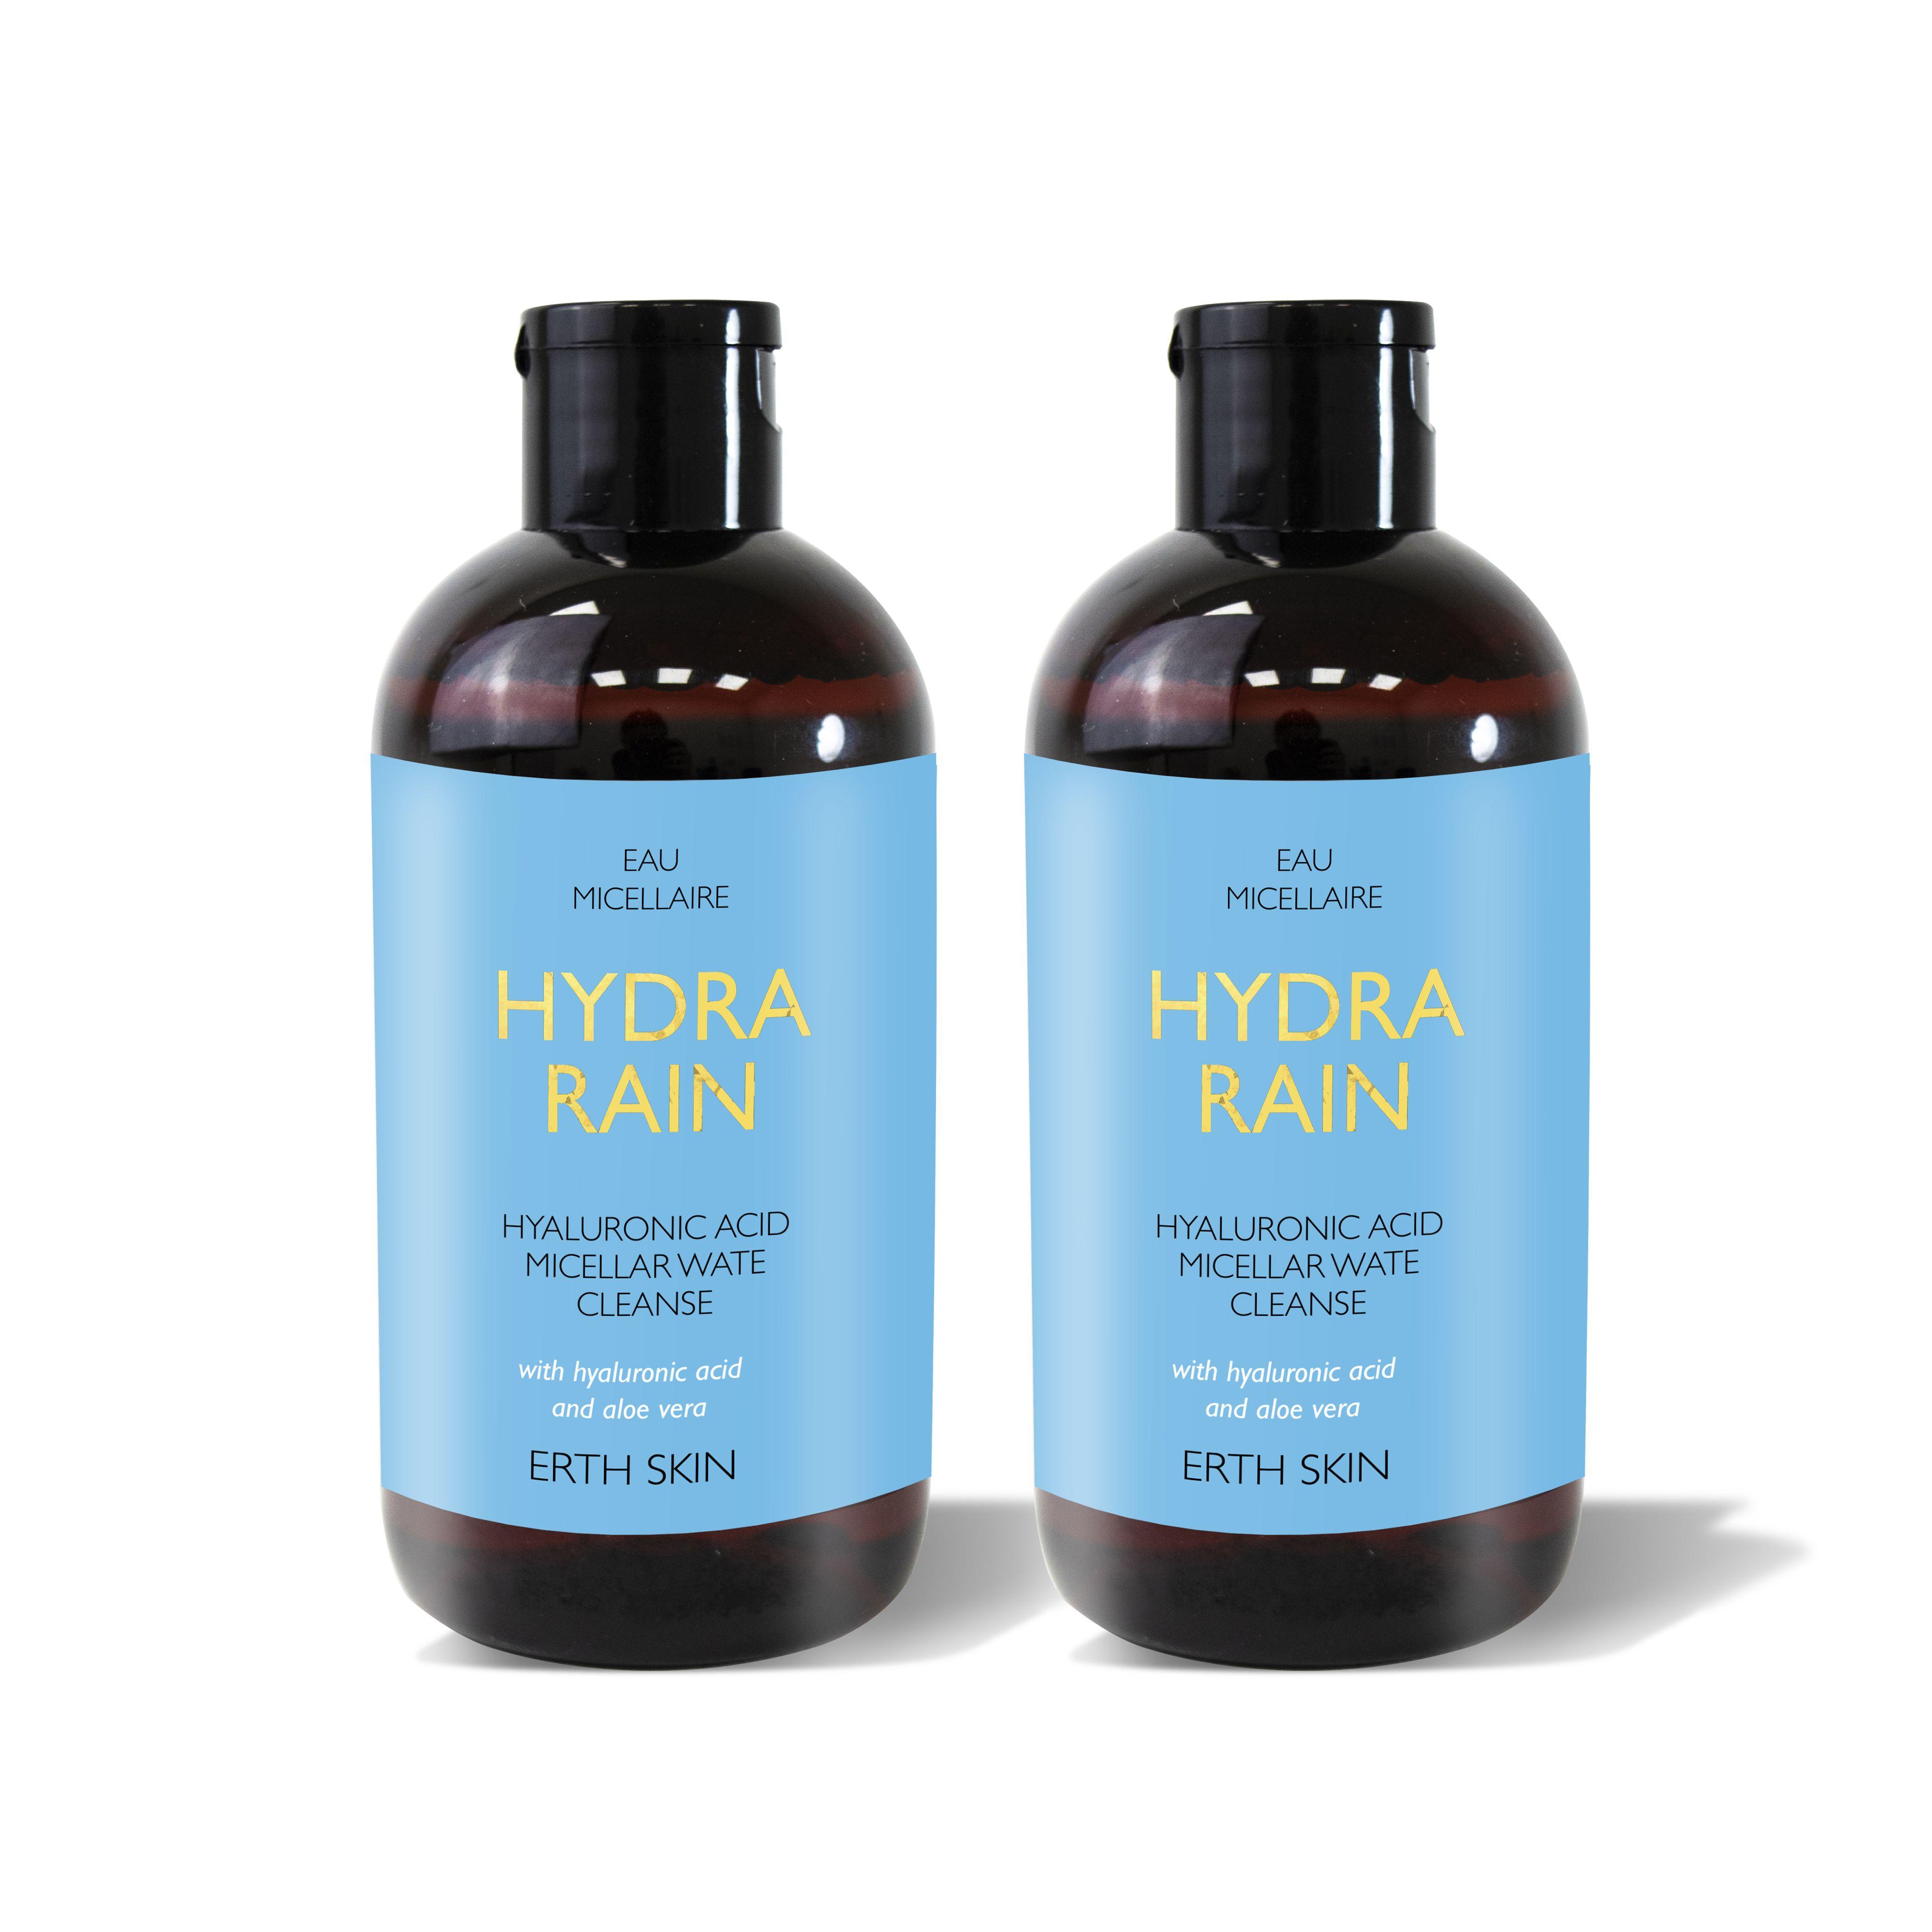 2 x HYDRA RAIN - micellar cleansing water